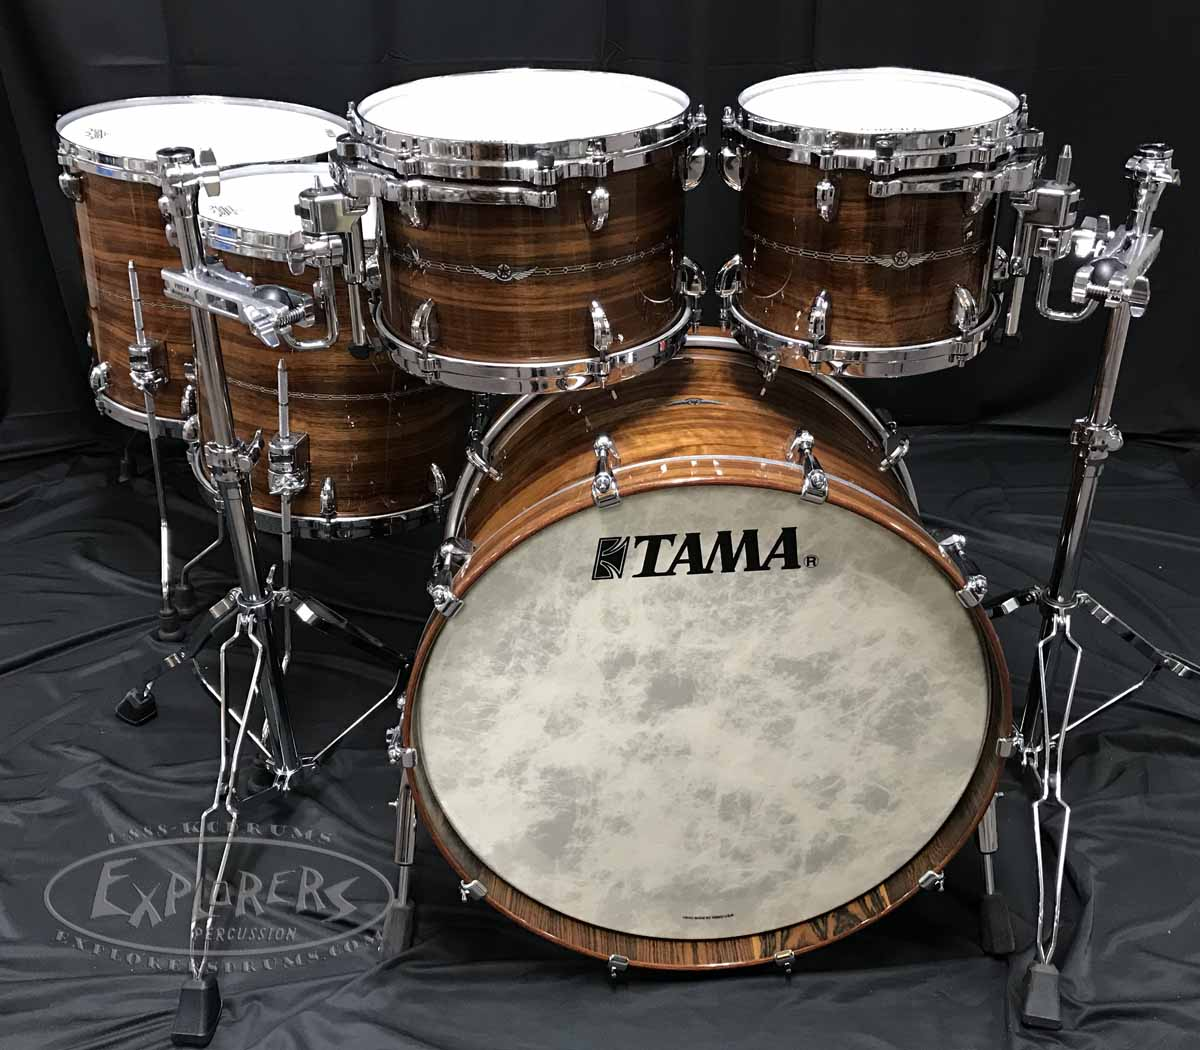 fc4730b347eb Tama Drum Set Star Series 5 Piece Bubinga Shell Pack in Natural ...